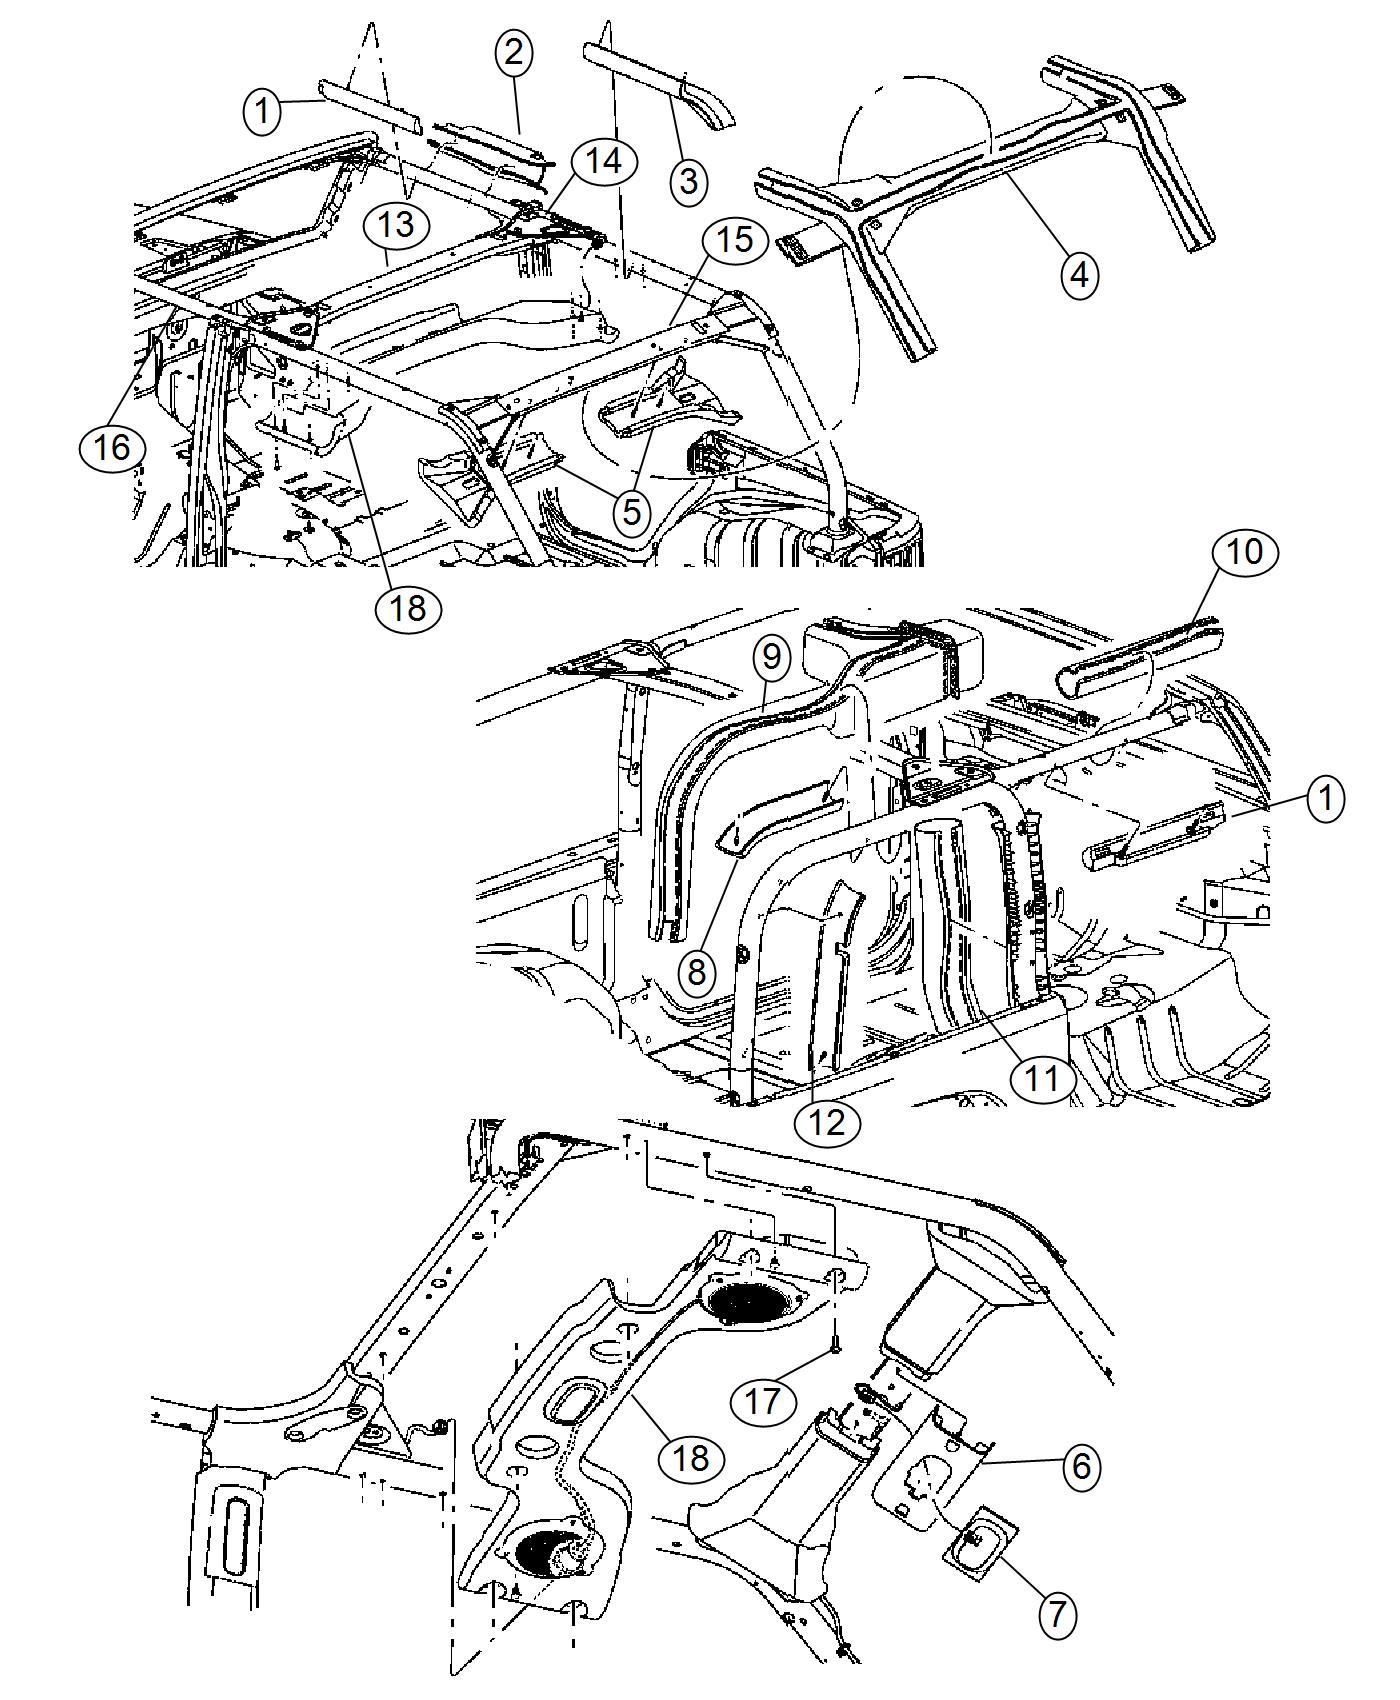 2018 Jeep Wrangler UNLIMITED RUBICON 3.6L V6 A/T 4X4 Side